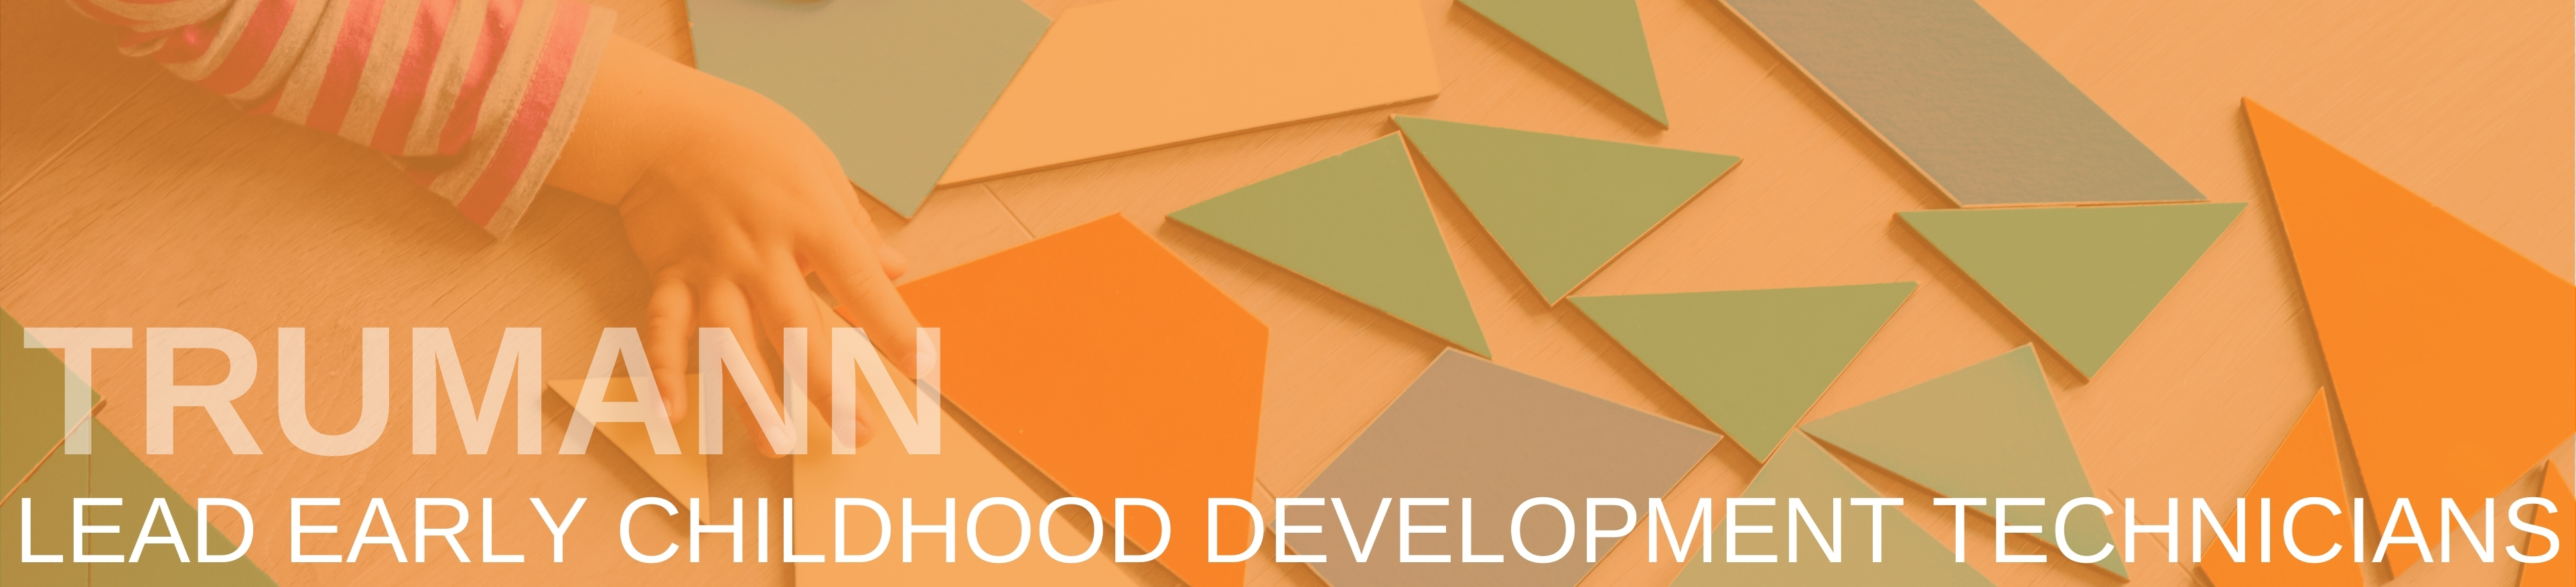 ECDS Header Image